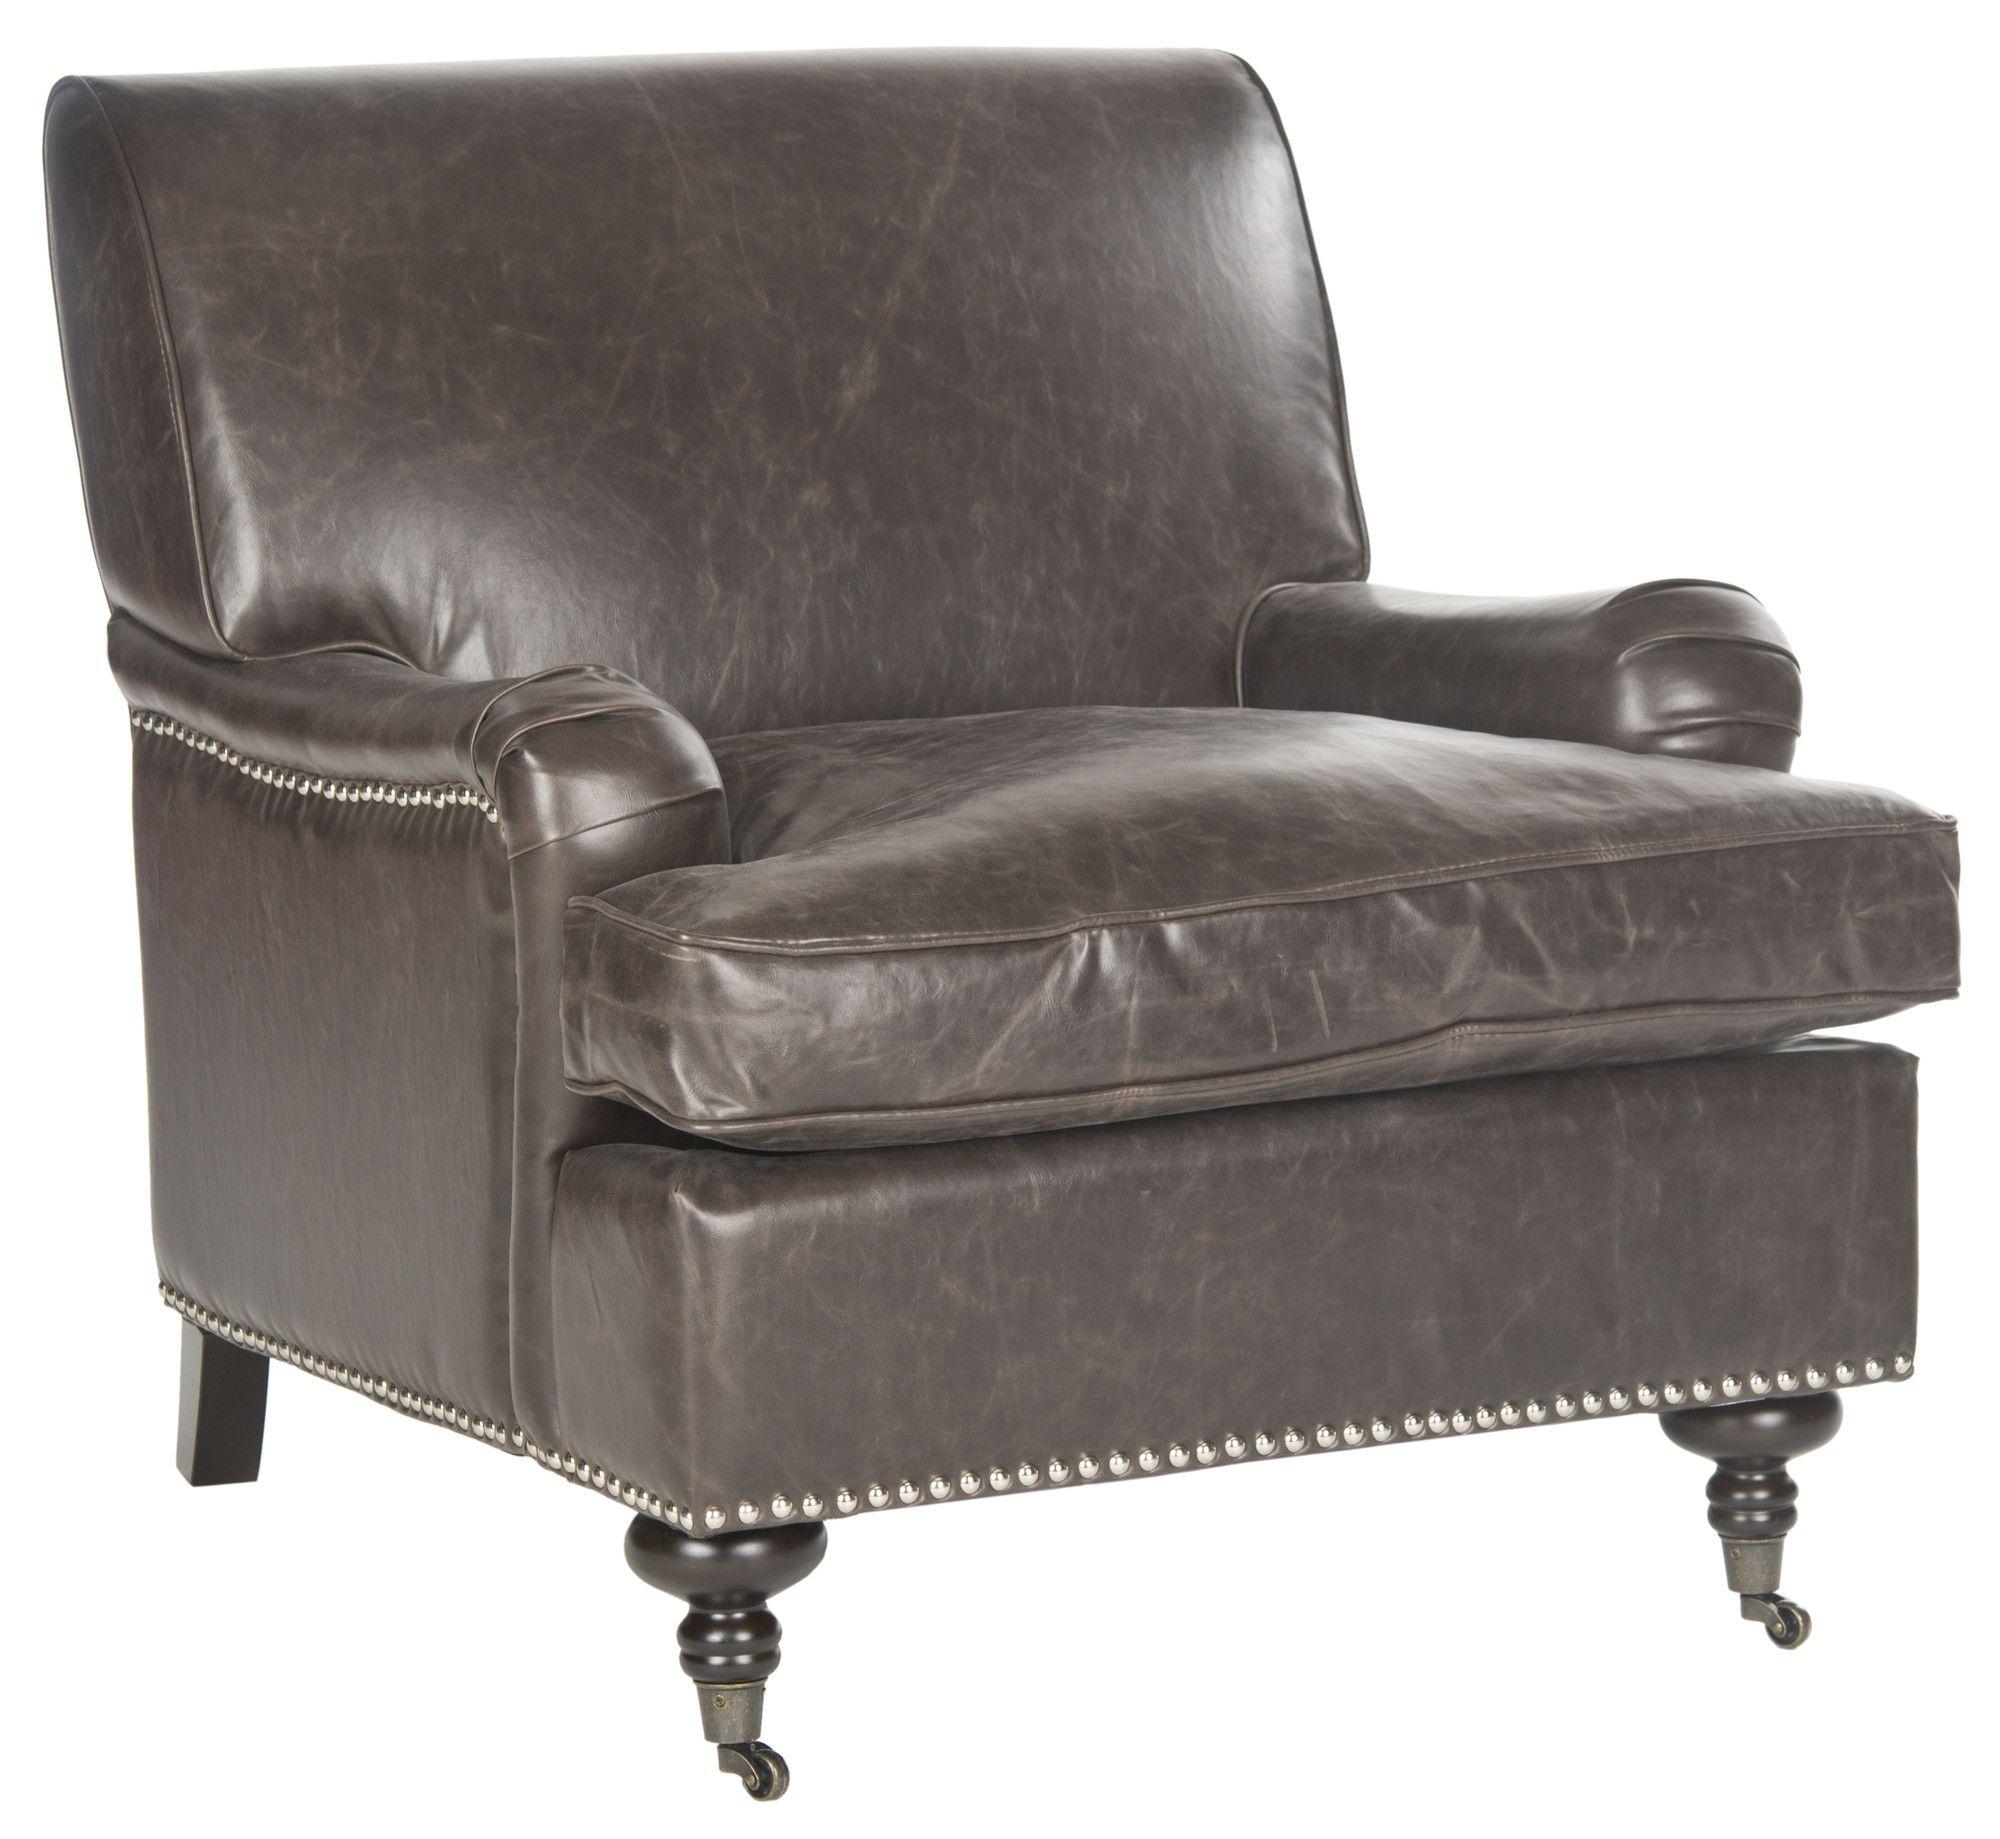 Beau Safavieh Mercer Chloe Club Chair U0026 Reviews | Wayfair